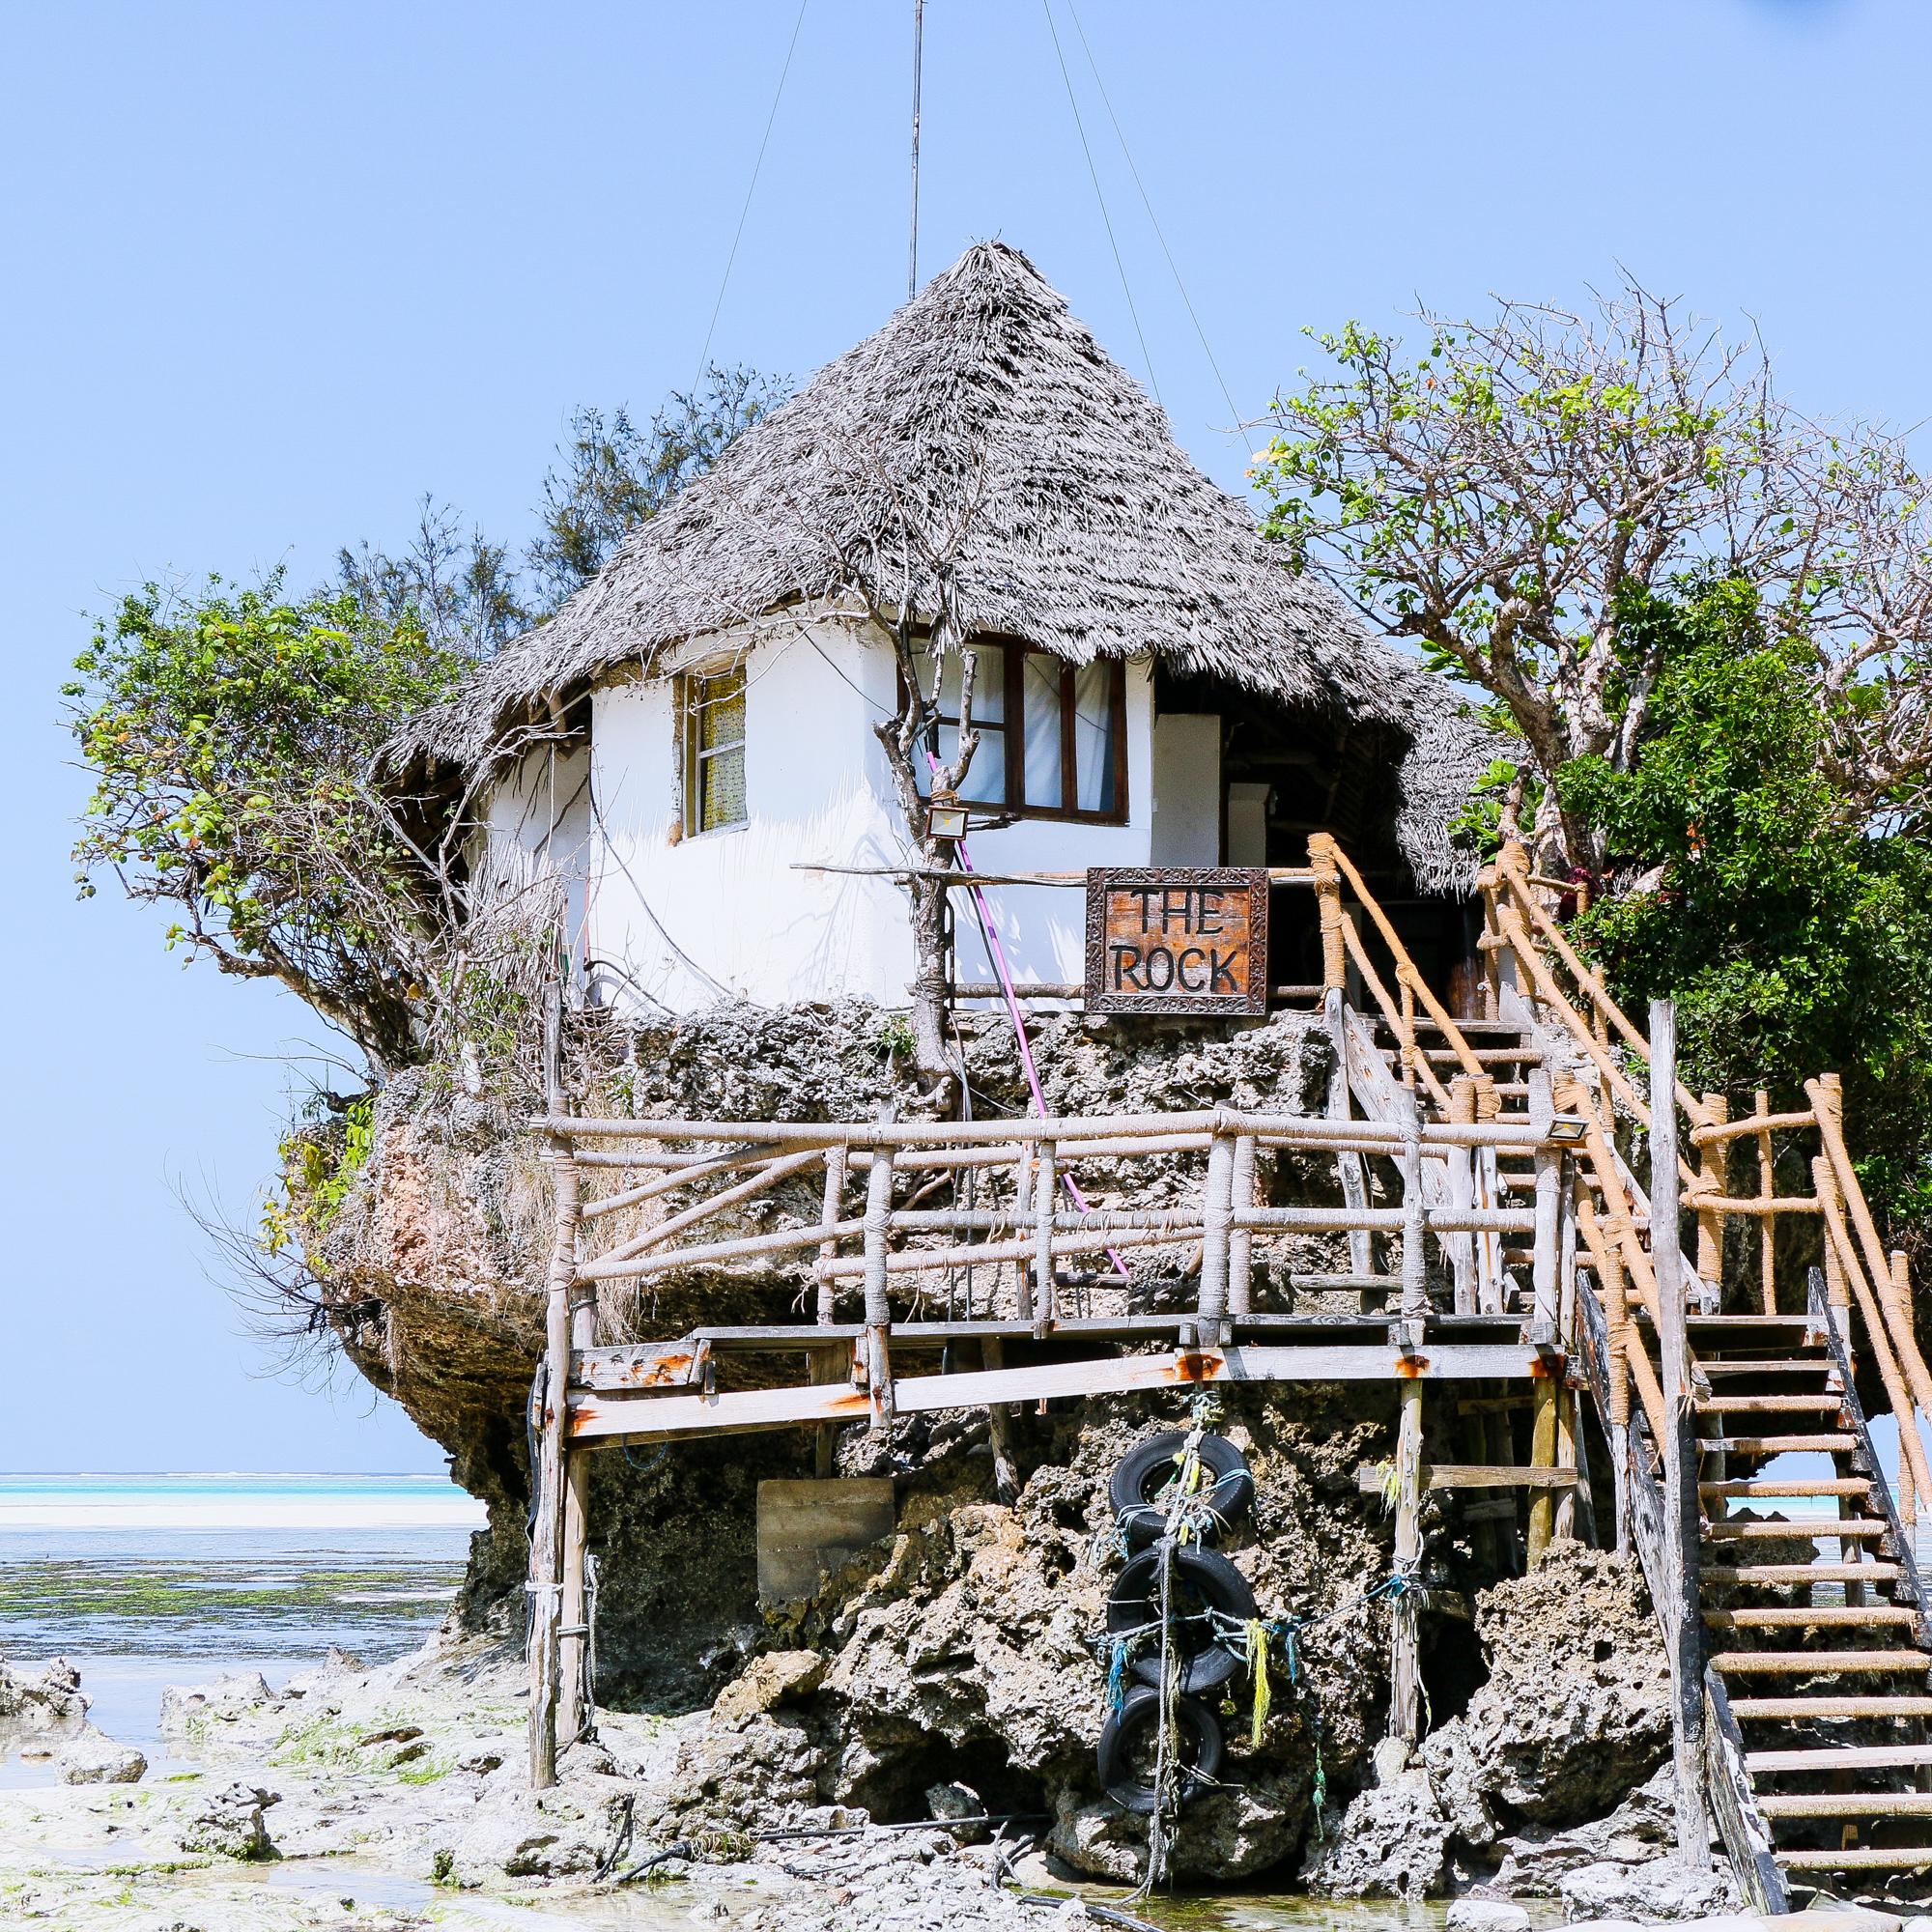 The Rock Restaurant, Pingwe Zanzibar